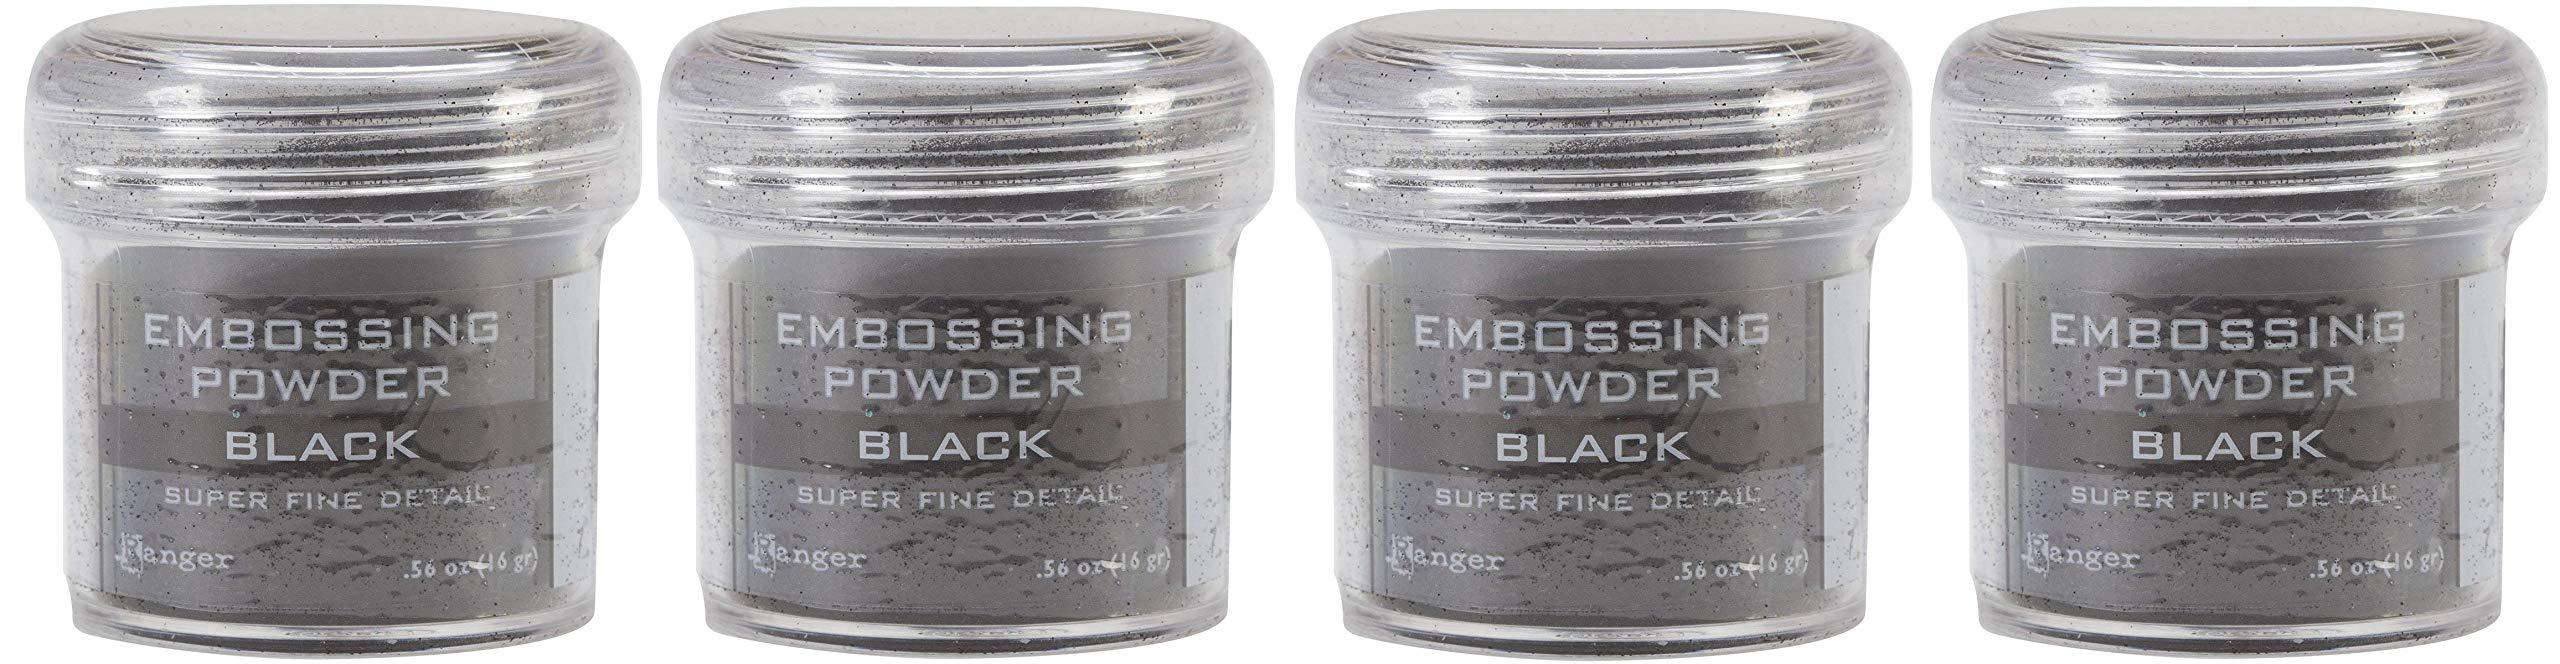 Ranger Embossing Powder.56 Ounce Jar, Black (4-(Pack))